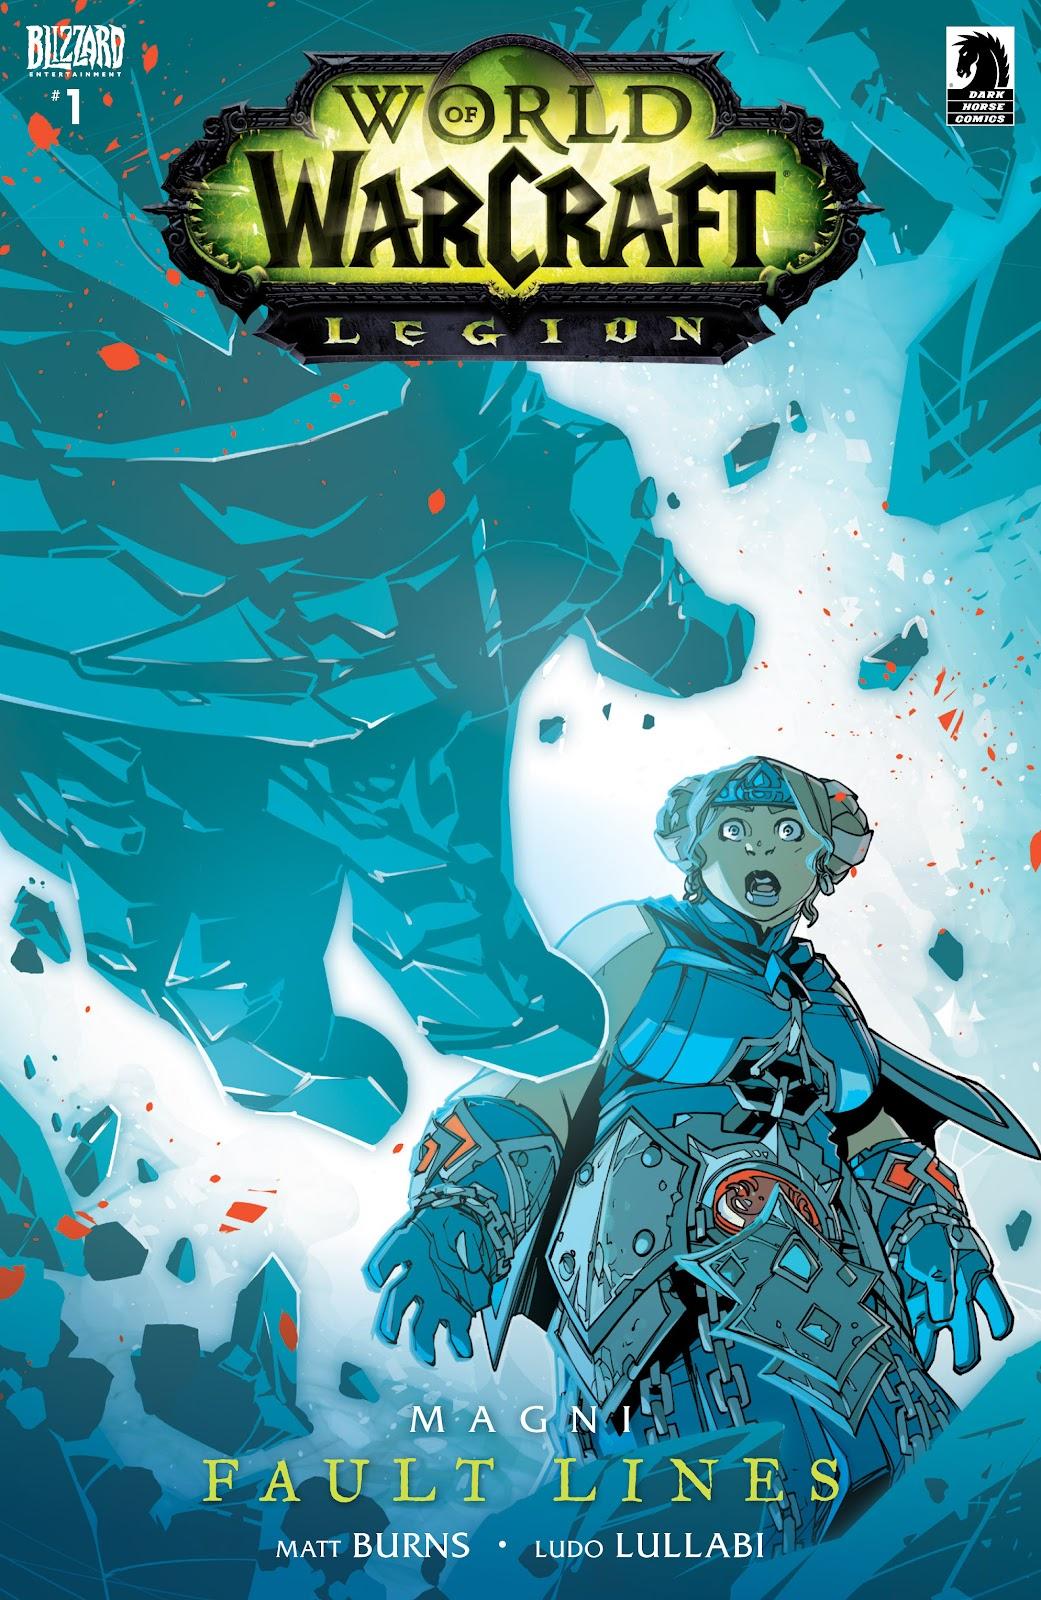 World of Warcraft: Legion 1 Page 1